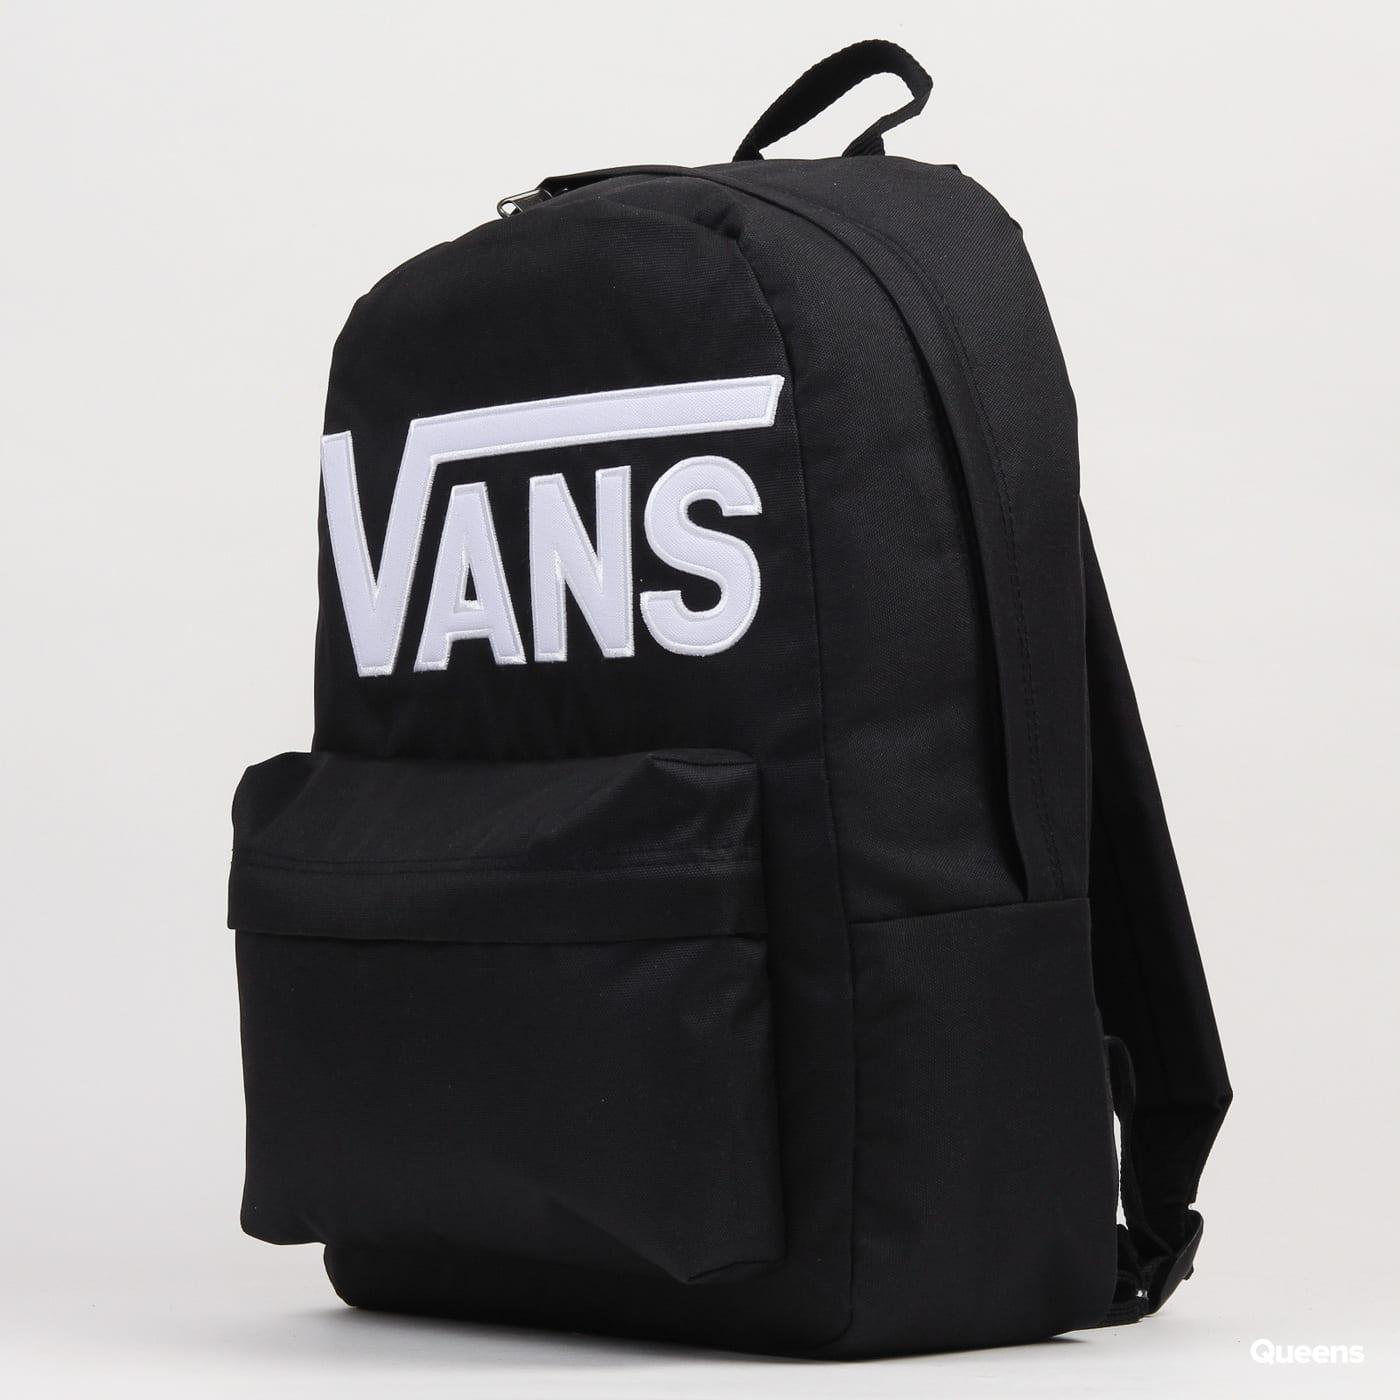 Vans Old Skool III schwarz / weiß